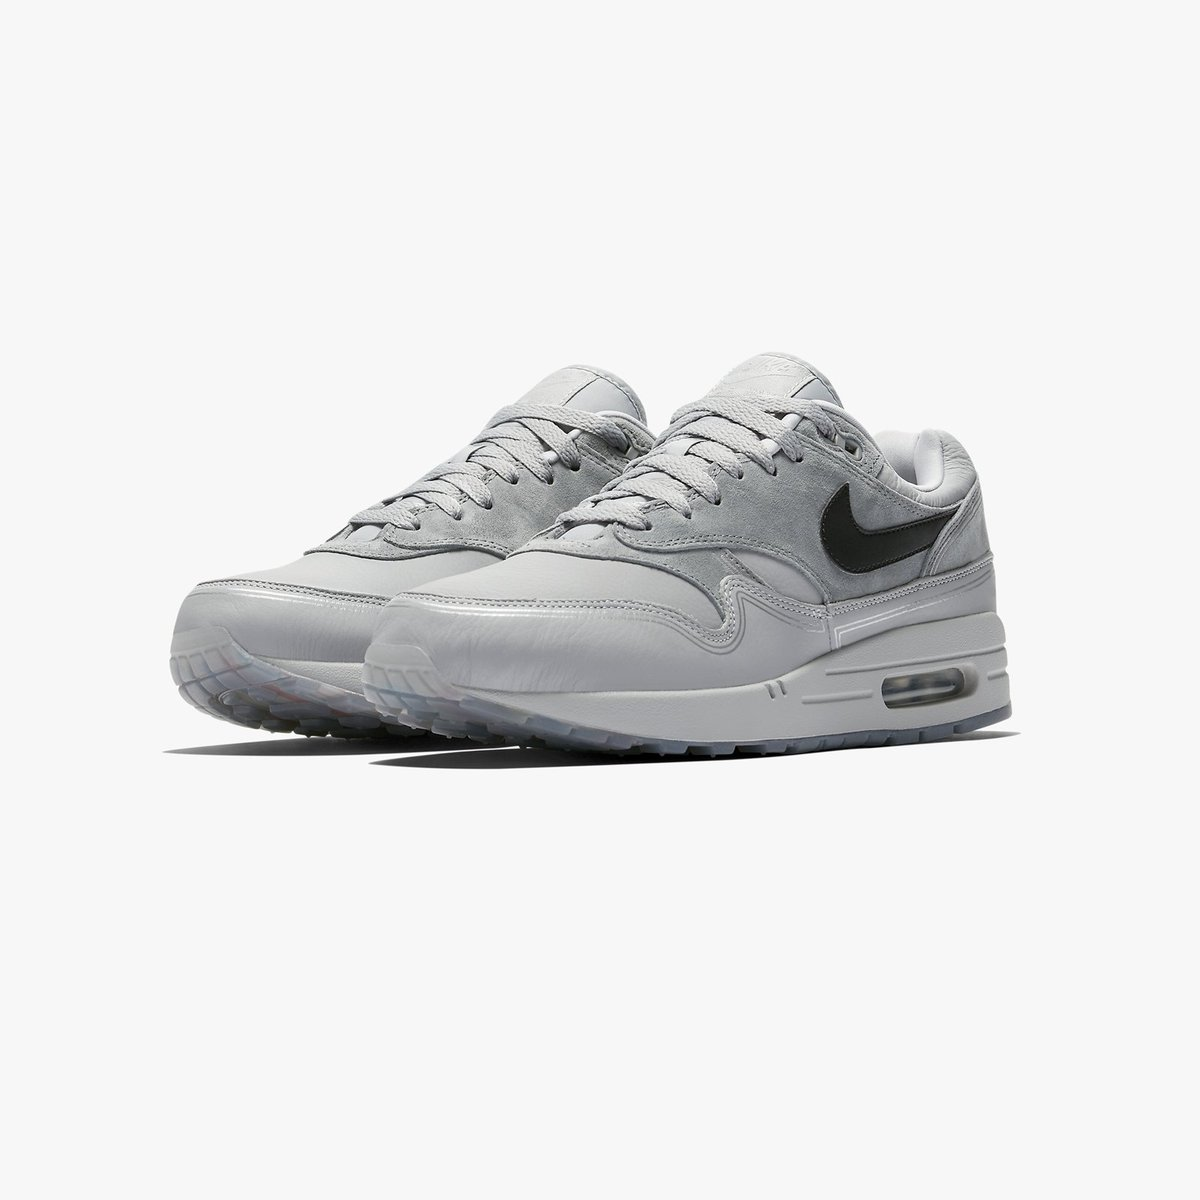 fc3b78ea79cd The Nike Air Max 1